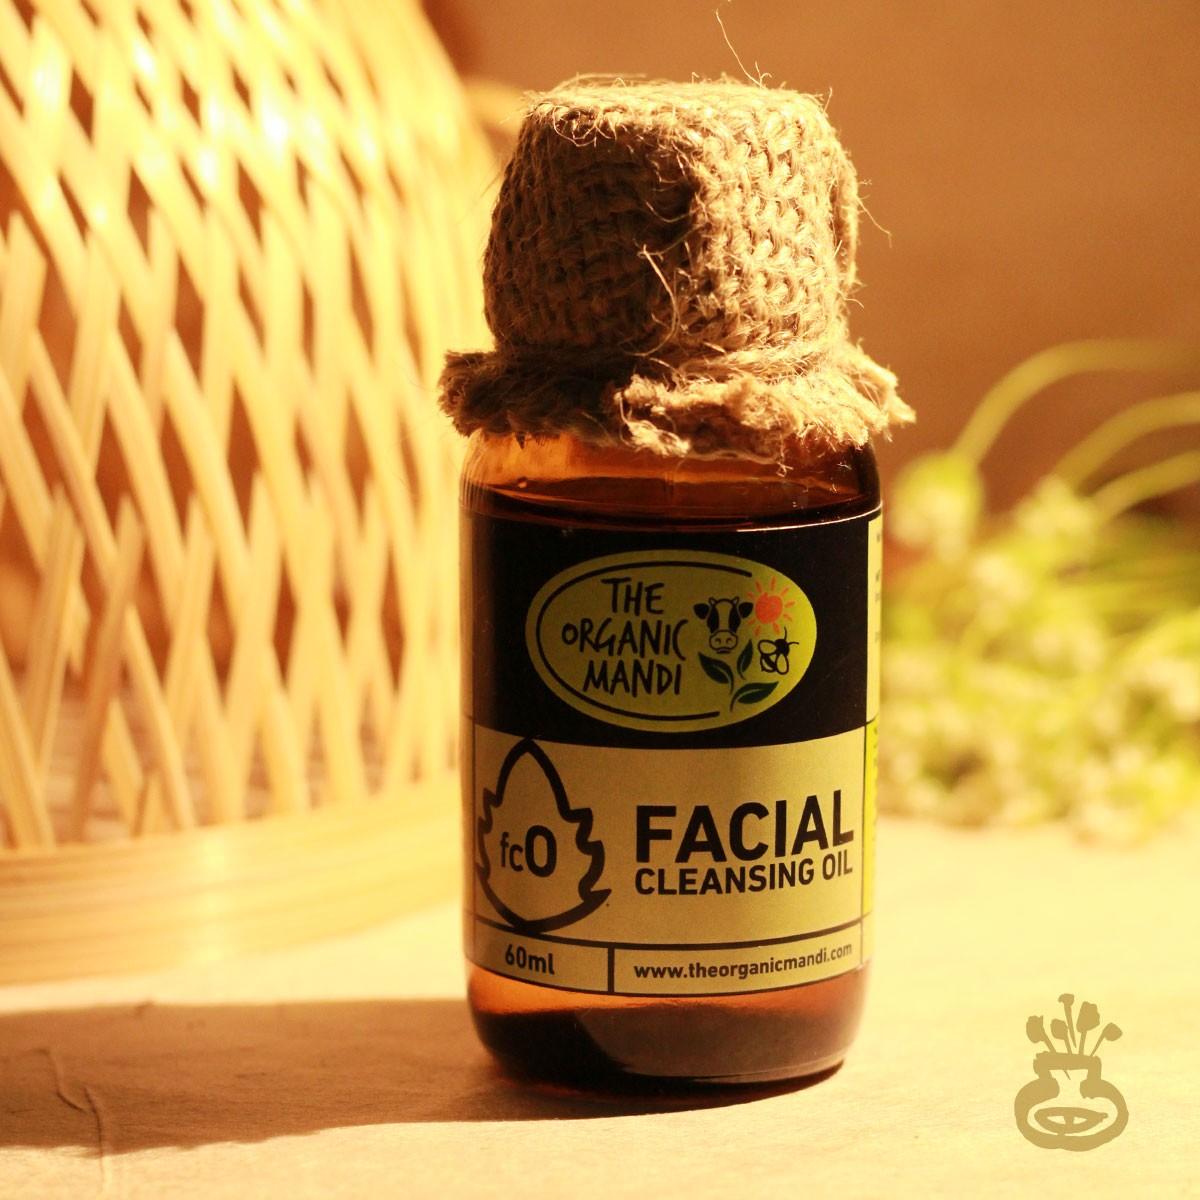 Facial Cleansing Oil (60ml)